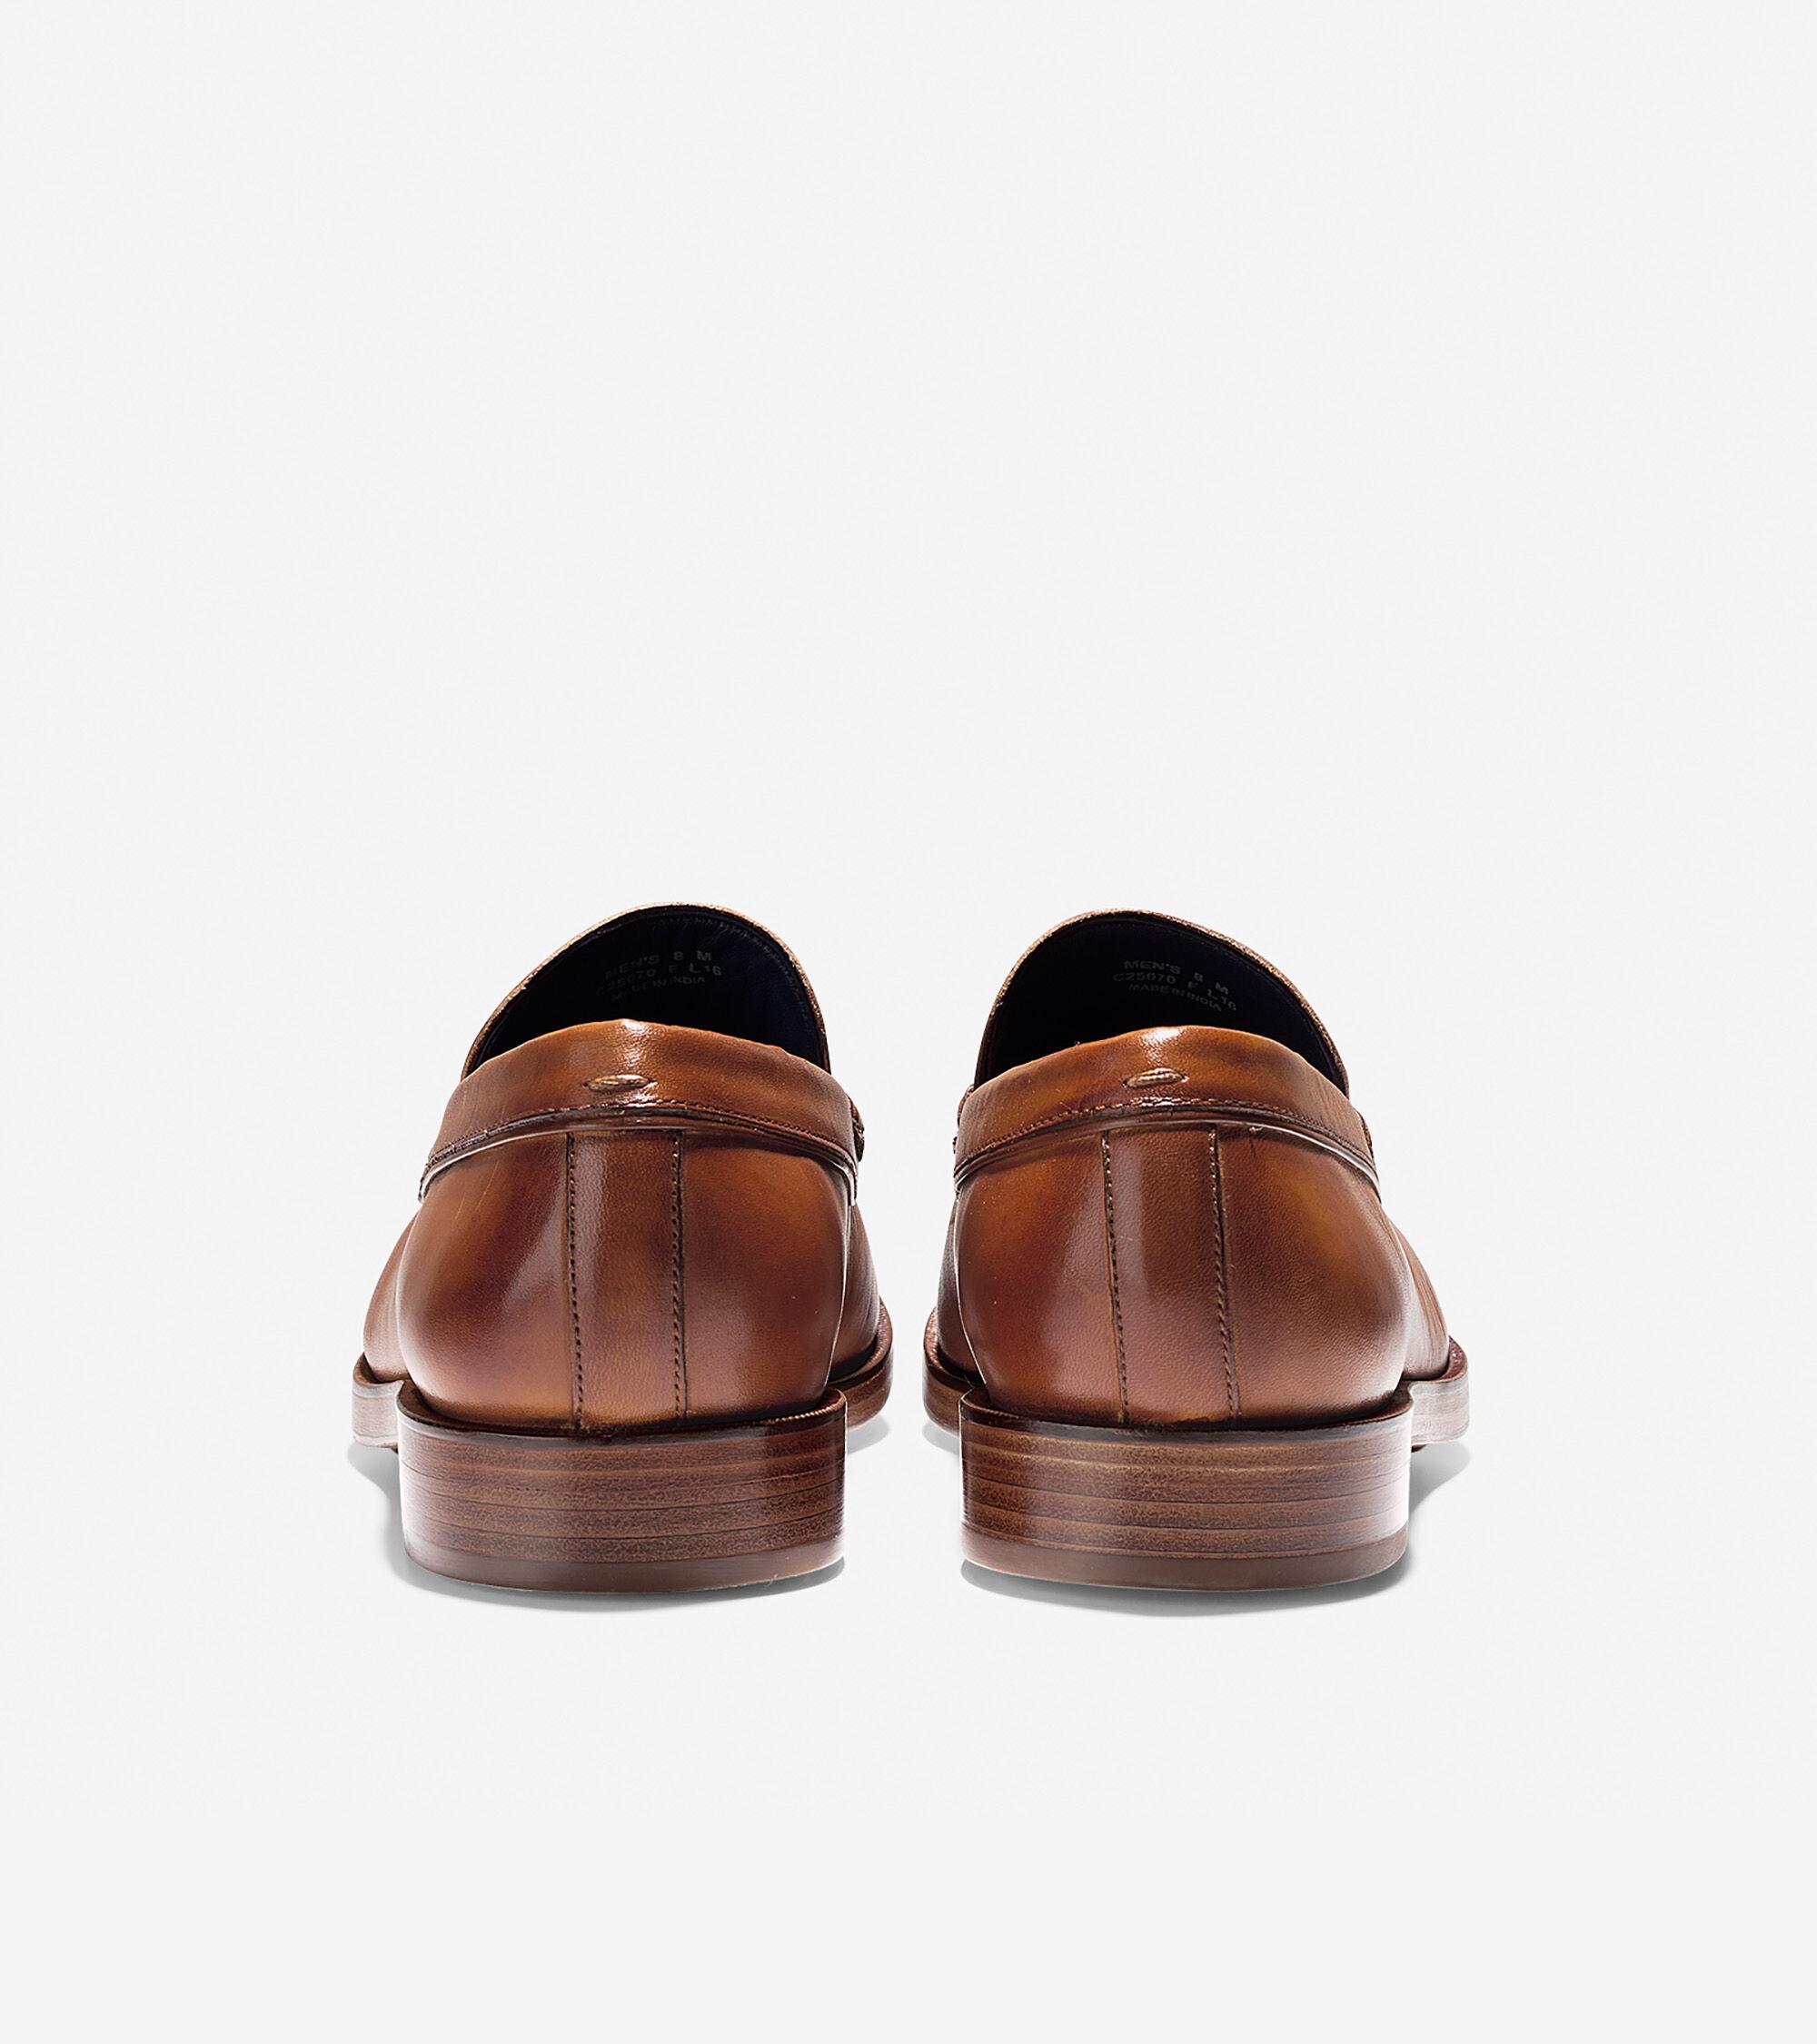 abe189fe143 Men s Hamilton Grand Penny Loafers in British Tan